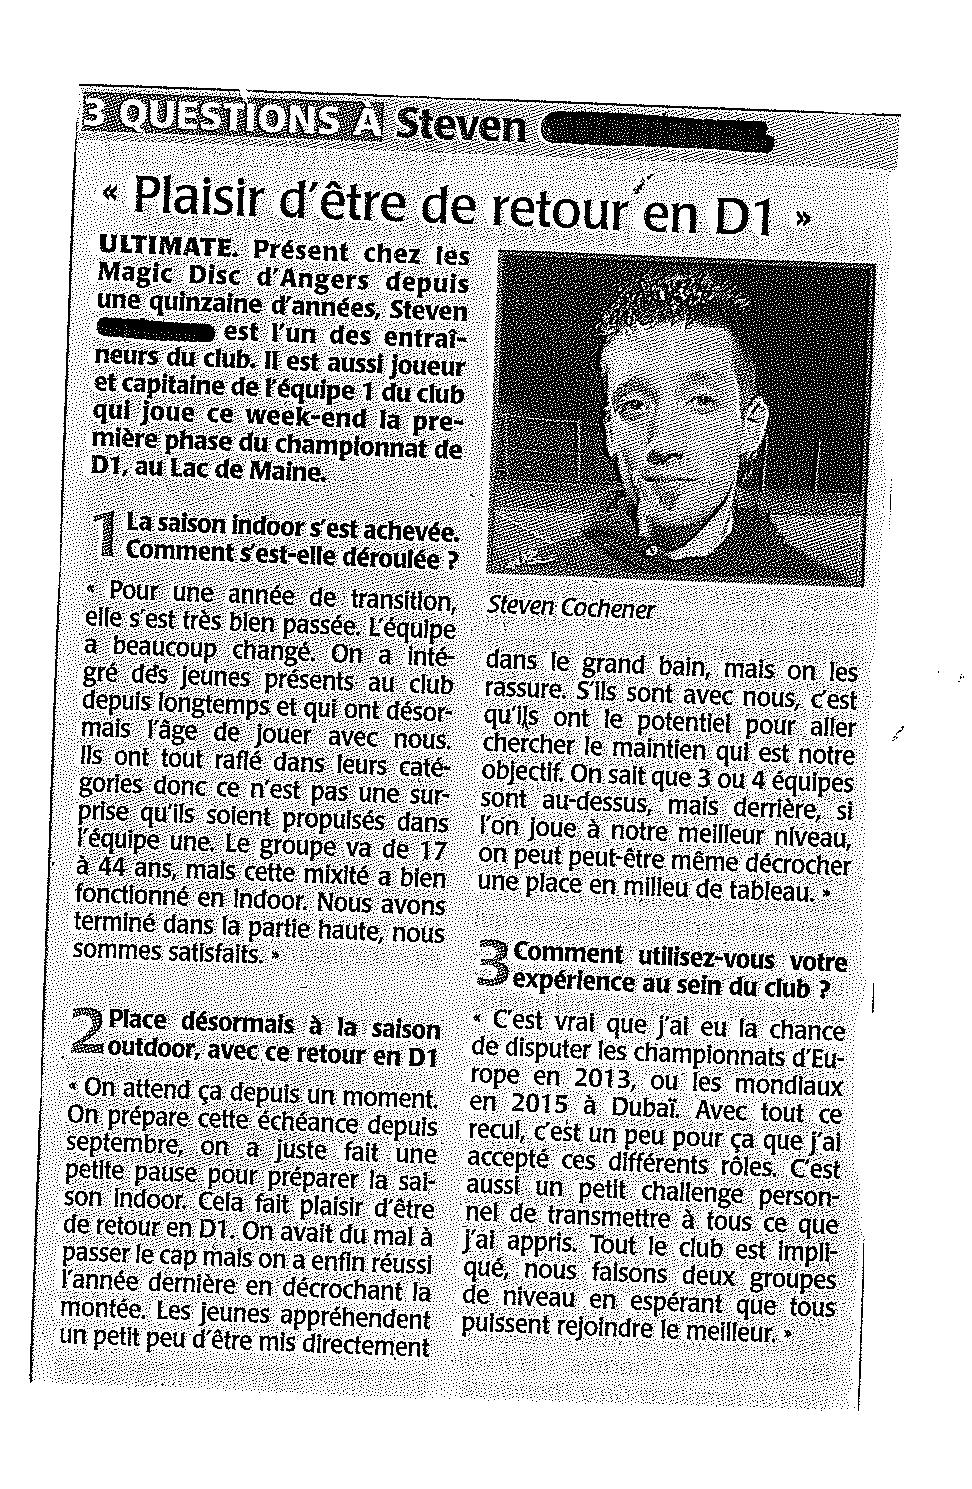 Article Steven